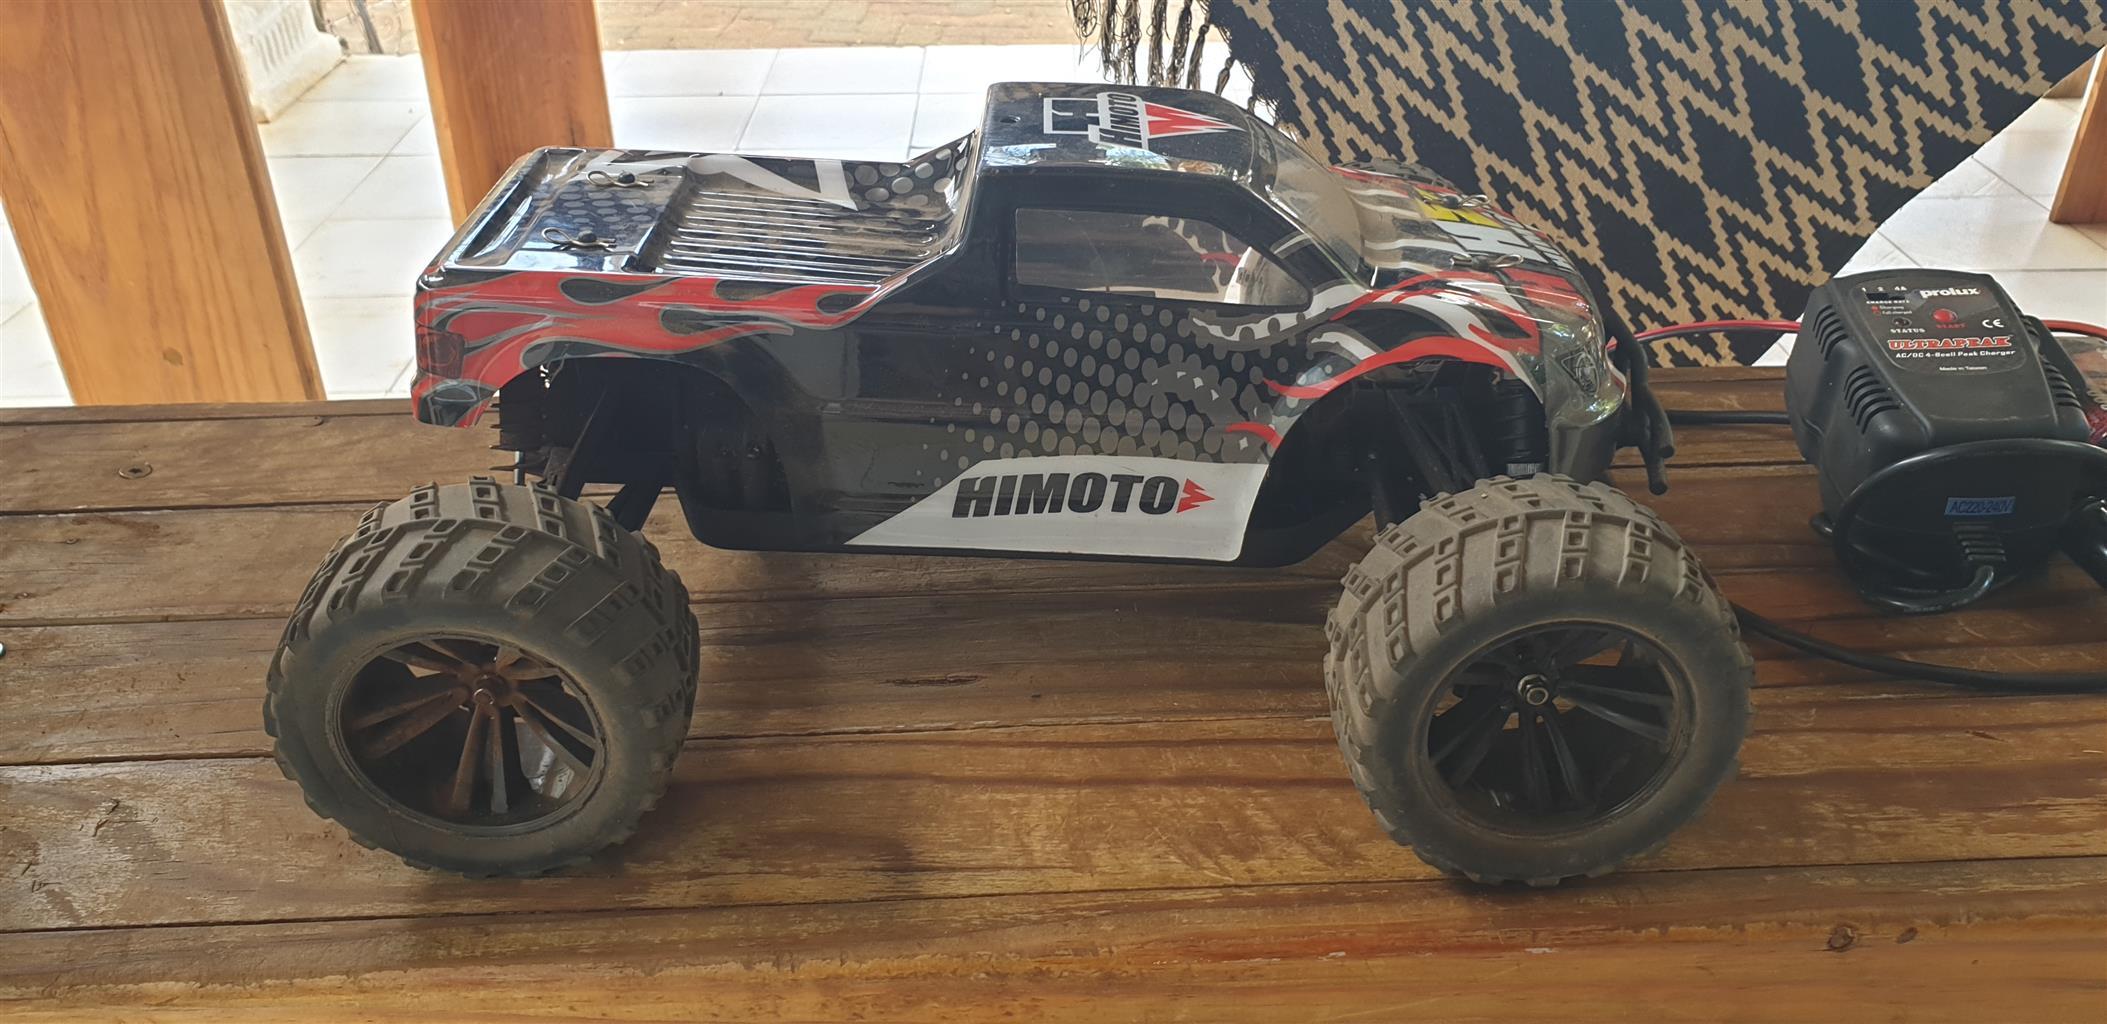 HImoto Electric RC Car